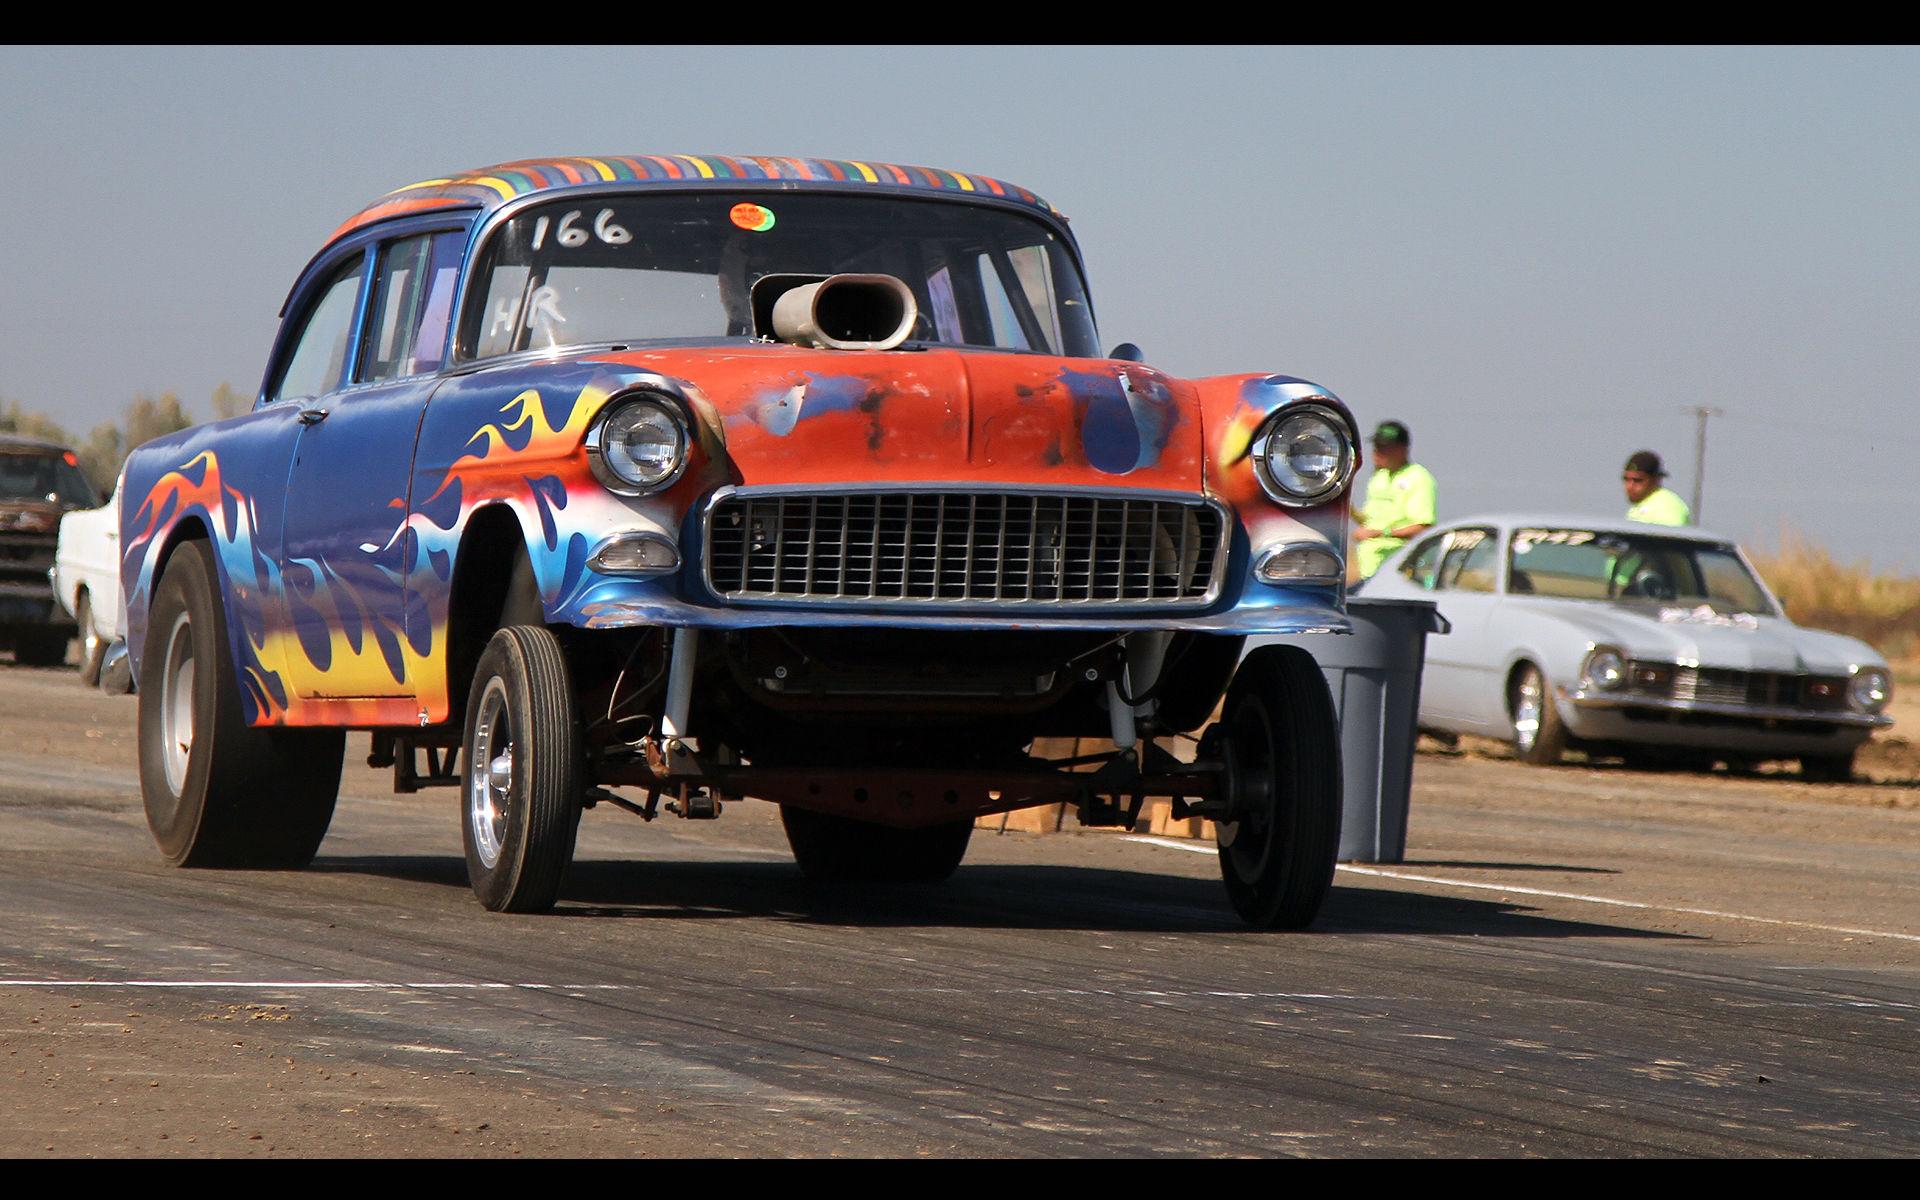 drag racing hd wallpaper background image 1920x1200